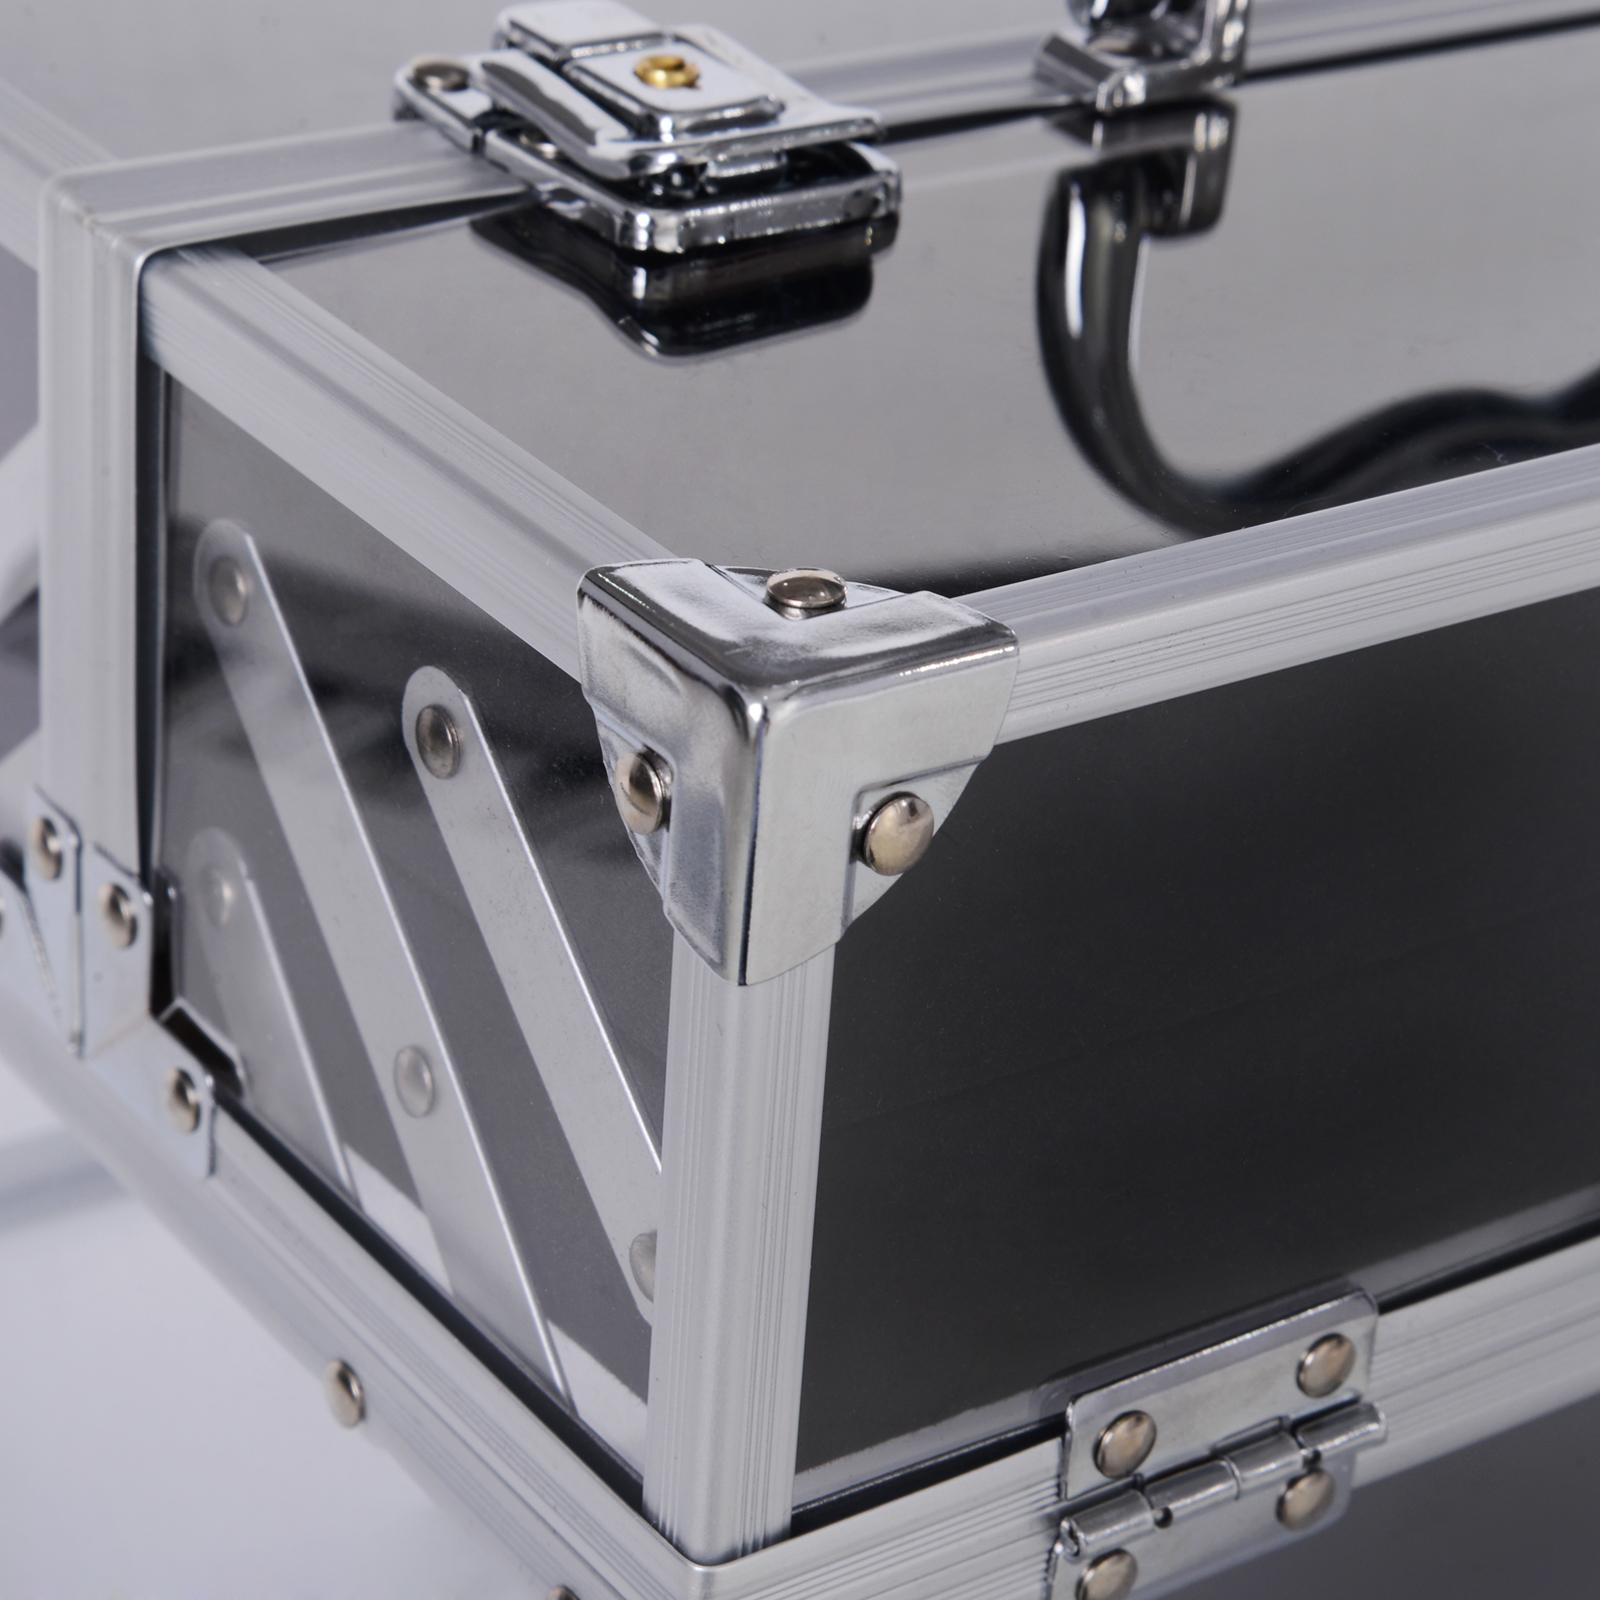 Portable-Makeup-Case-Train-Case-Lockable-Aluminum-with-4-Trays thumbnail 24